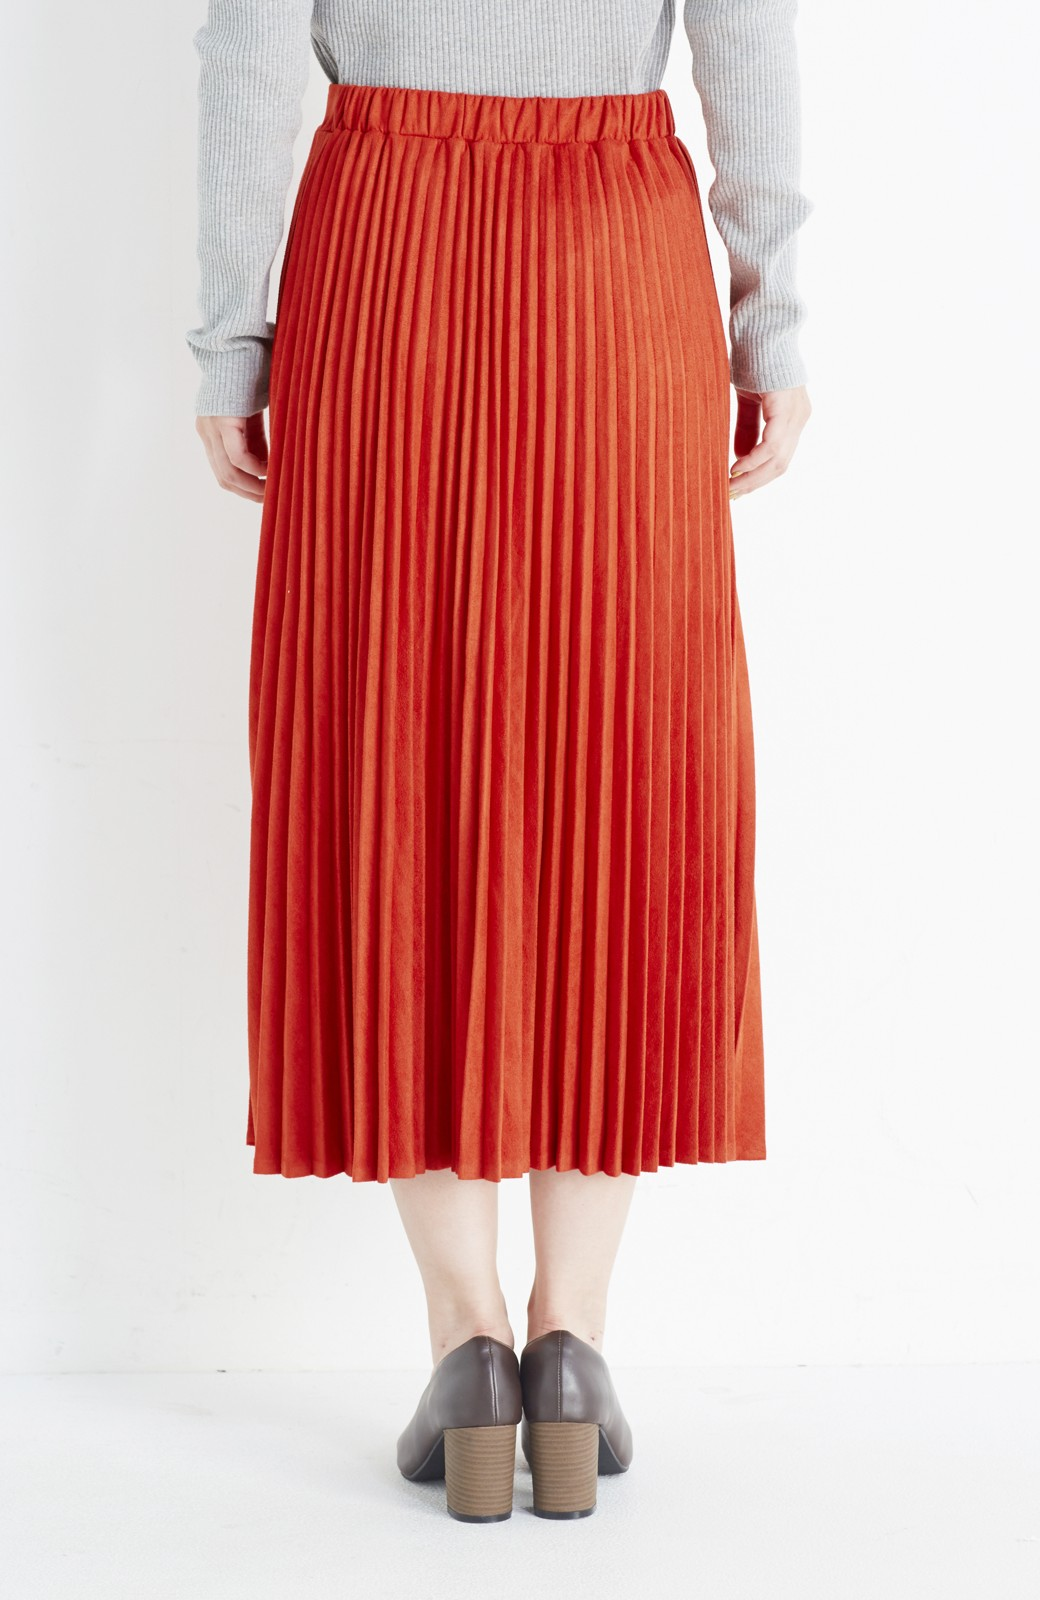 haco! 楽して女っぽい フェイクスエードのプリーツスカート  by que made me <オレンジ系その他>の商品写真5